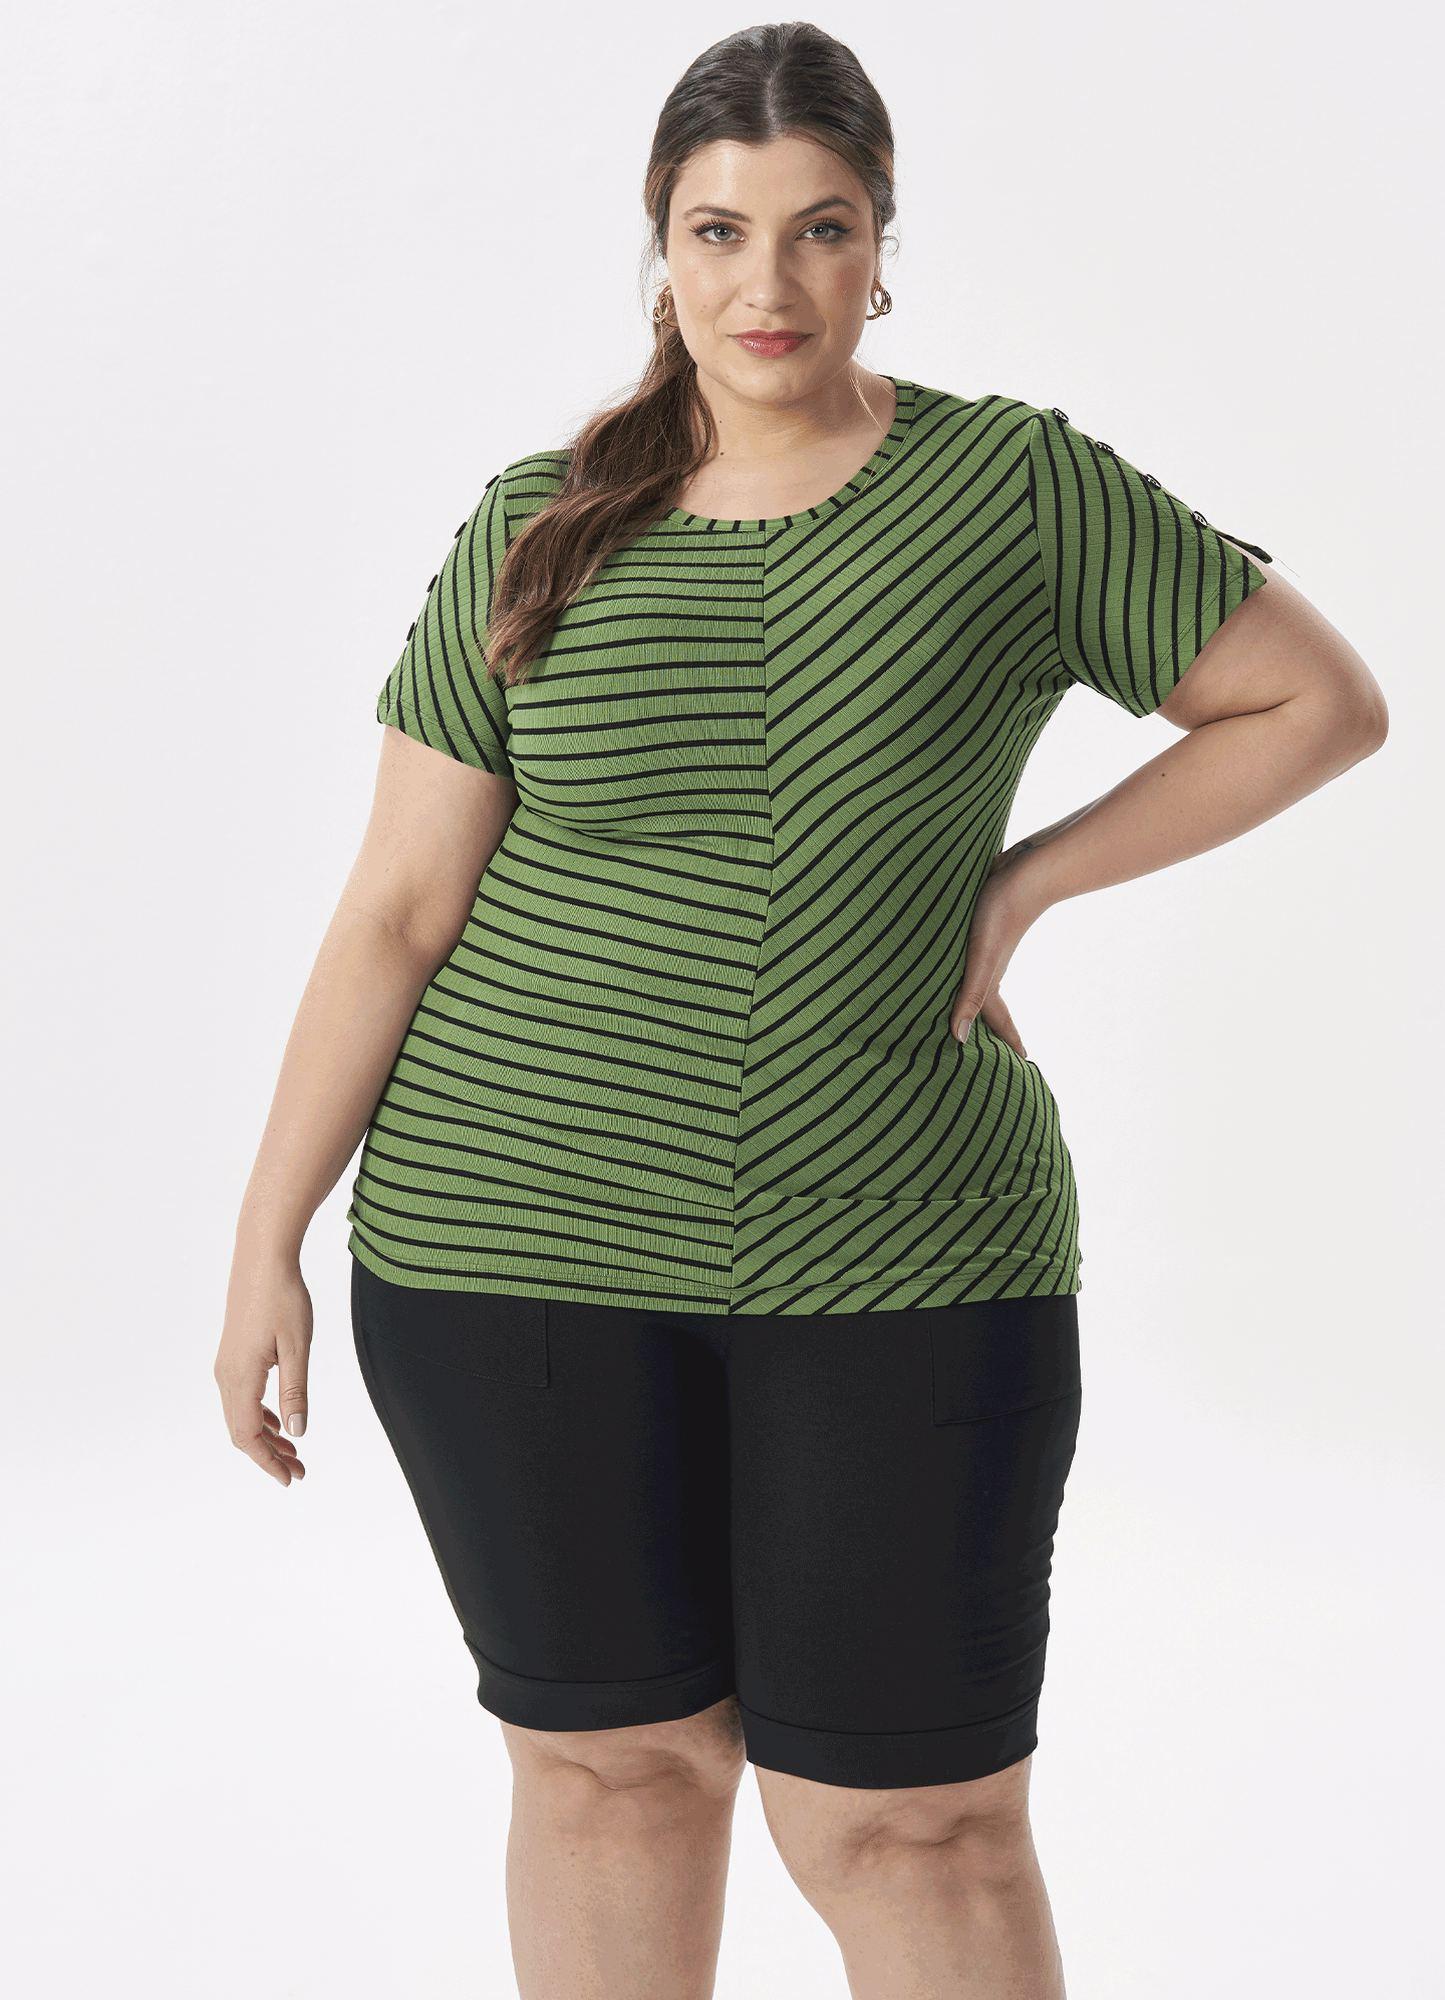 Blusa Feminina Plus Size Listrada Decote V